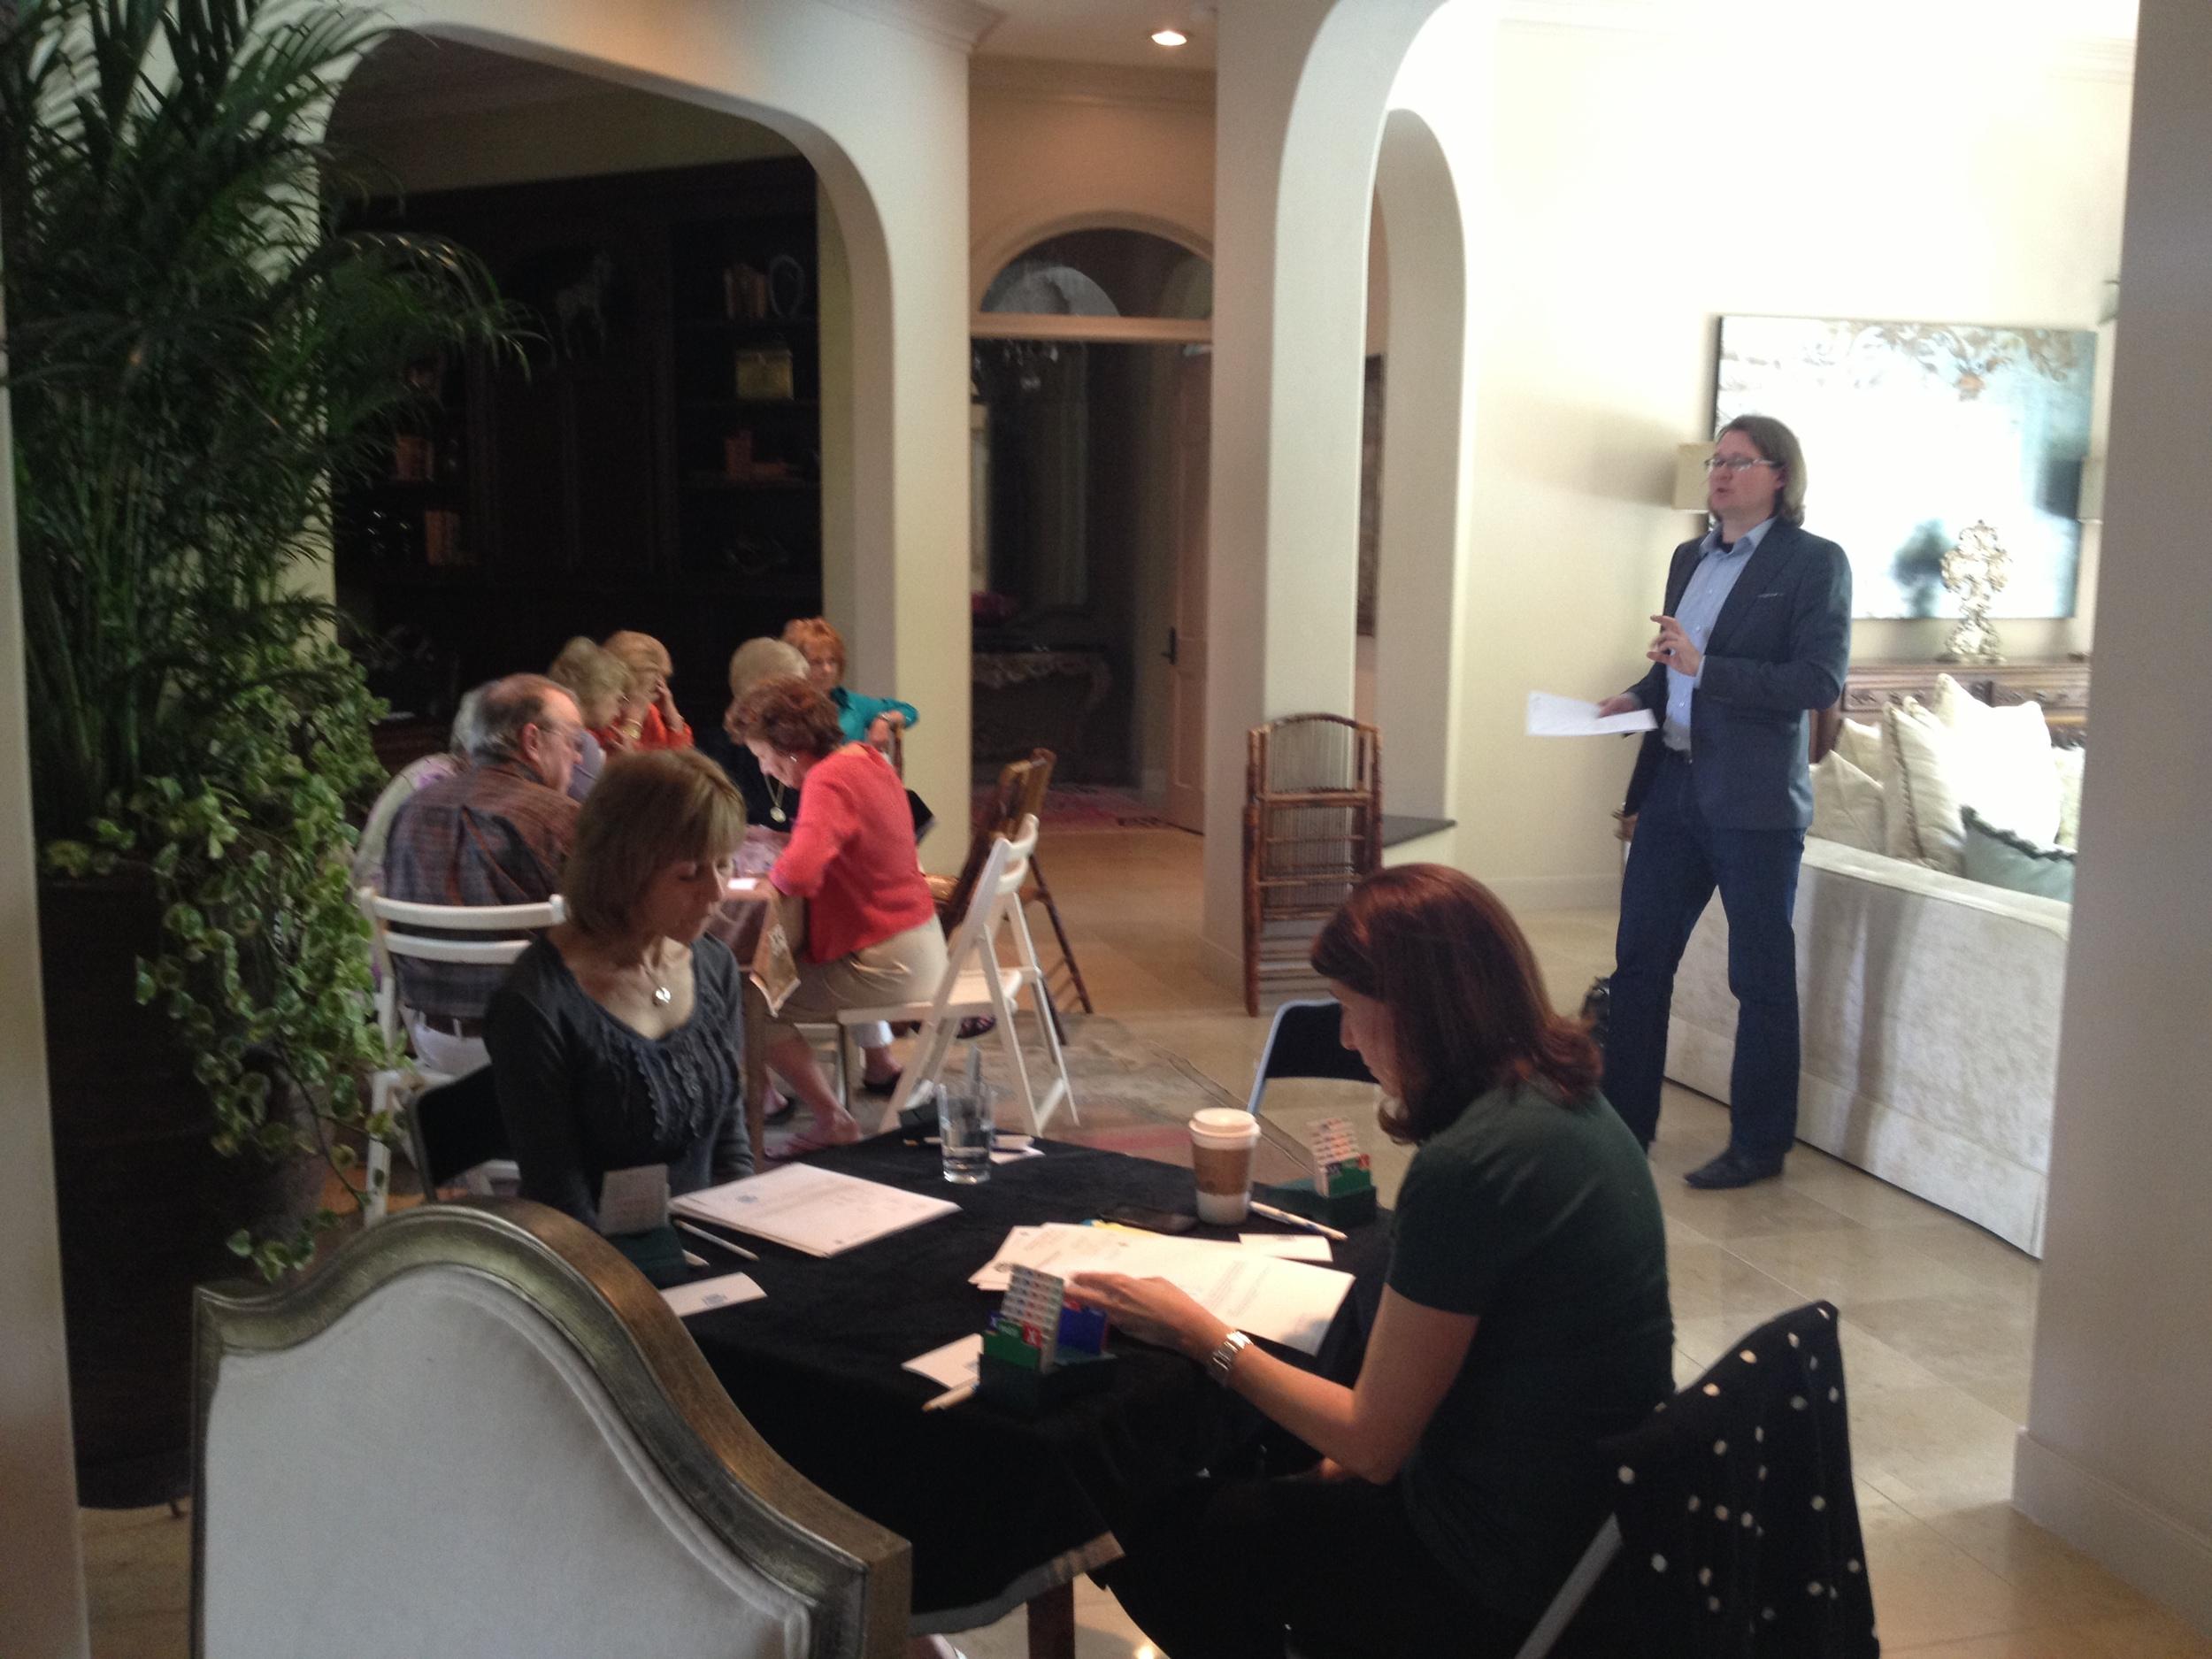 Robert Teaching - Houston 2013